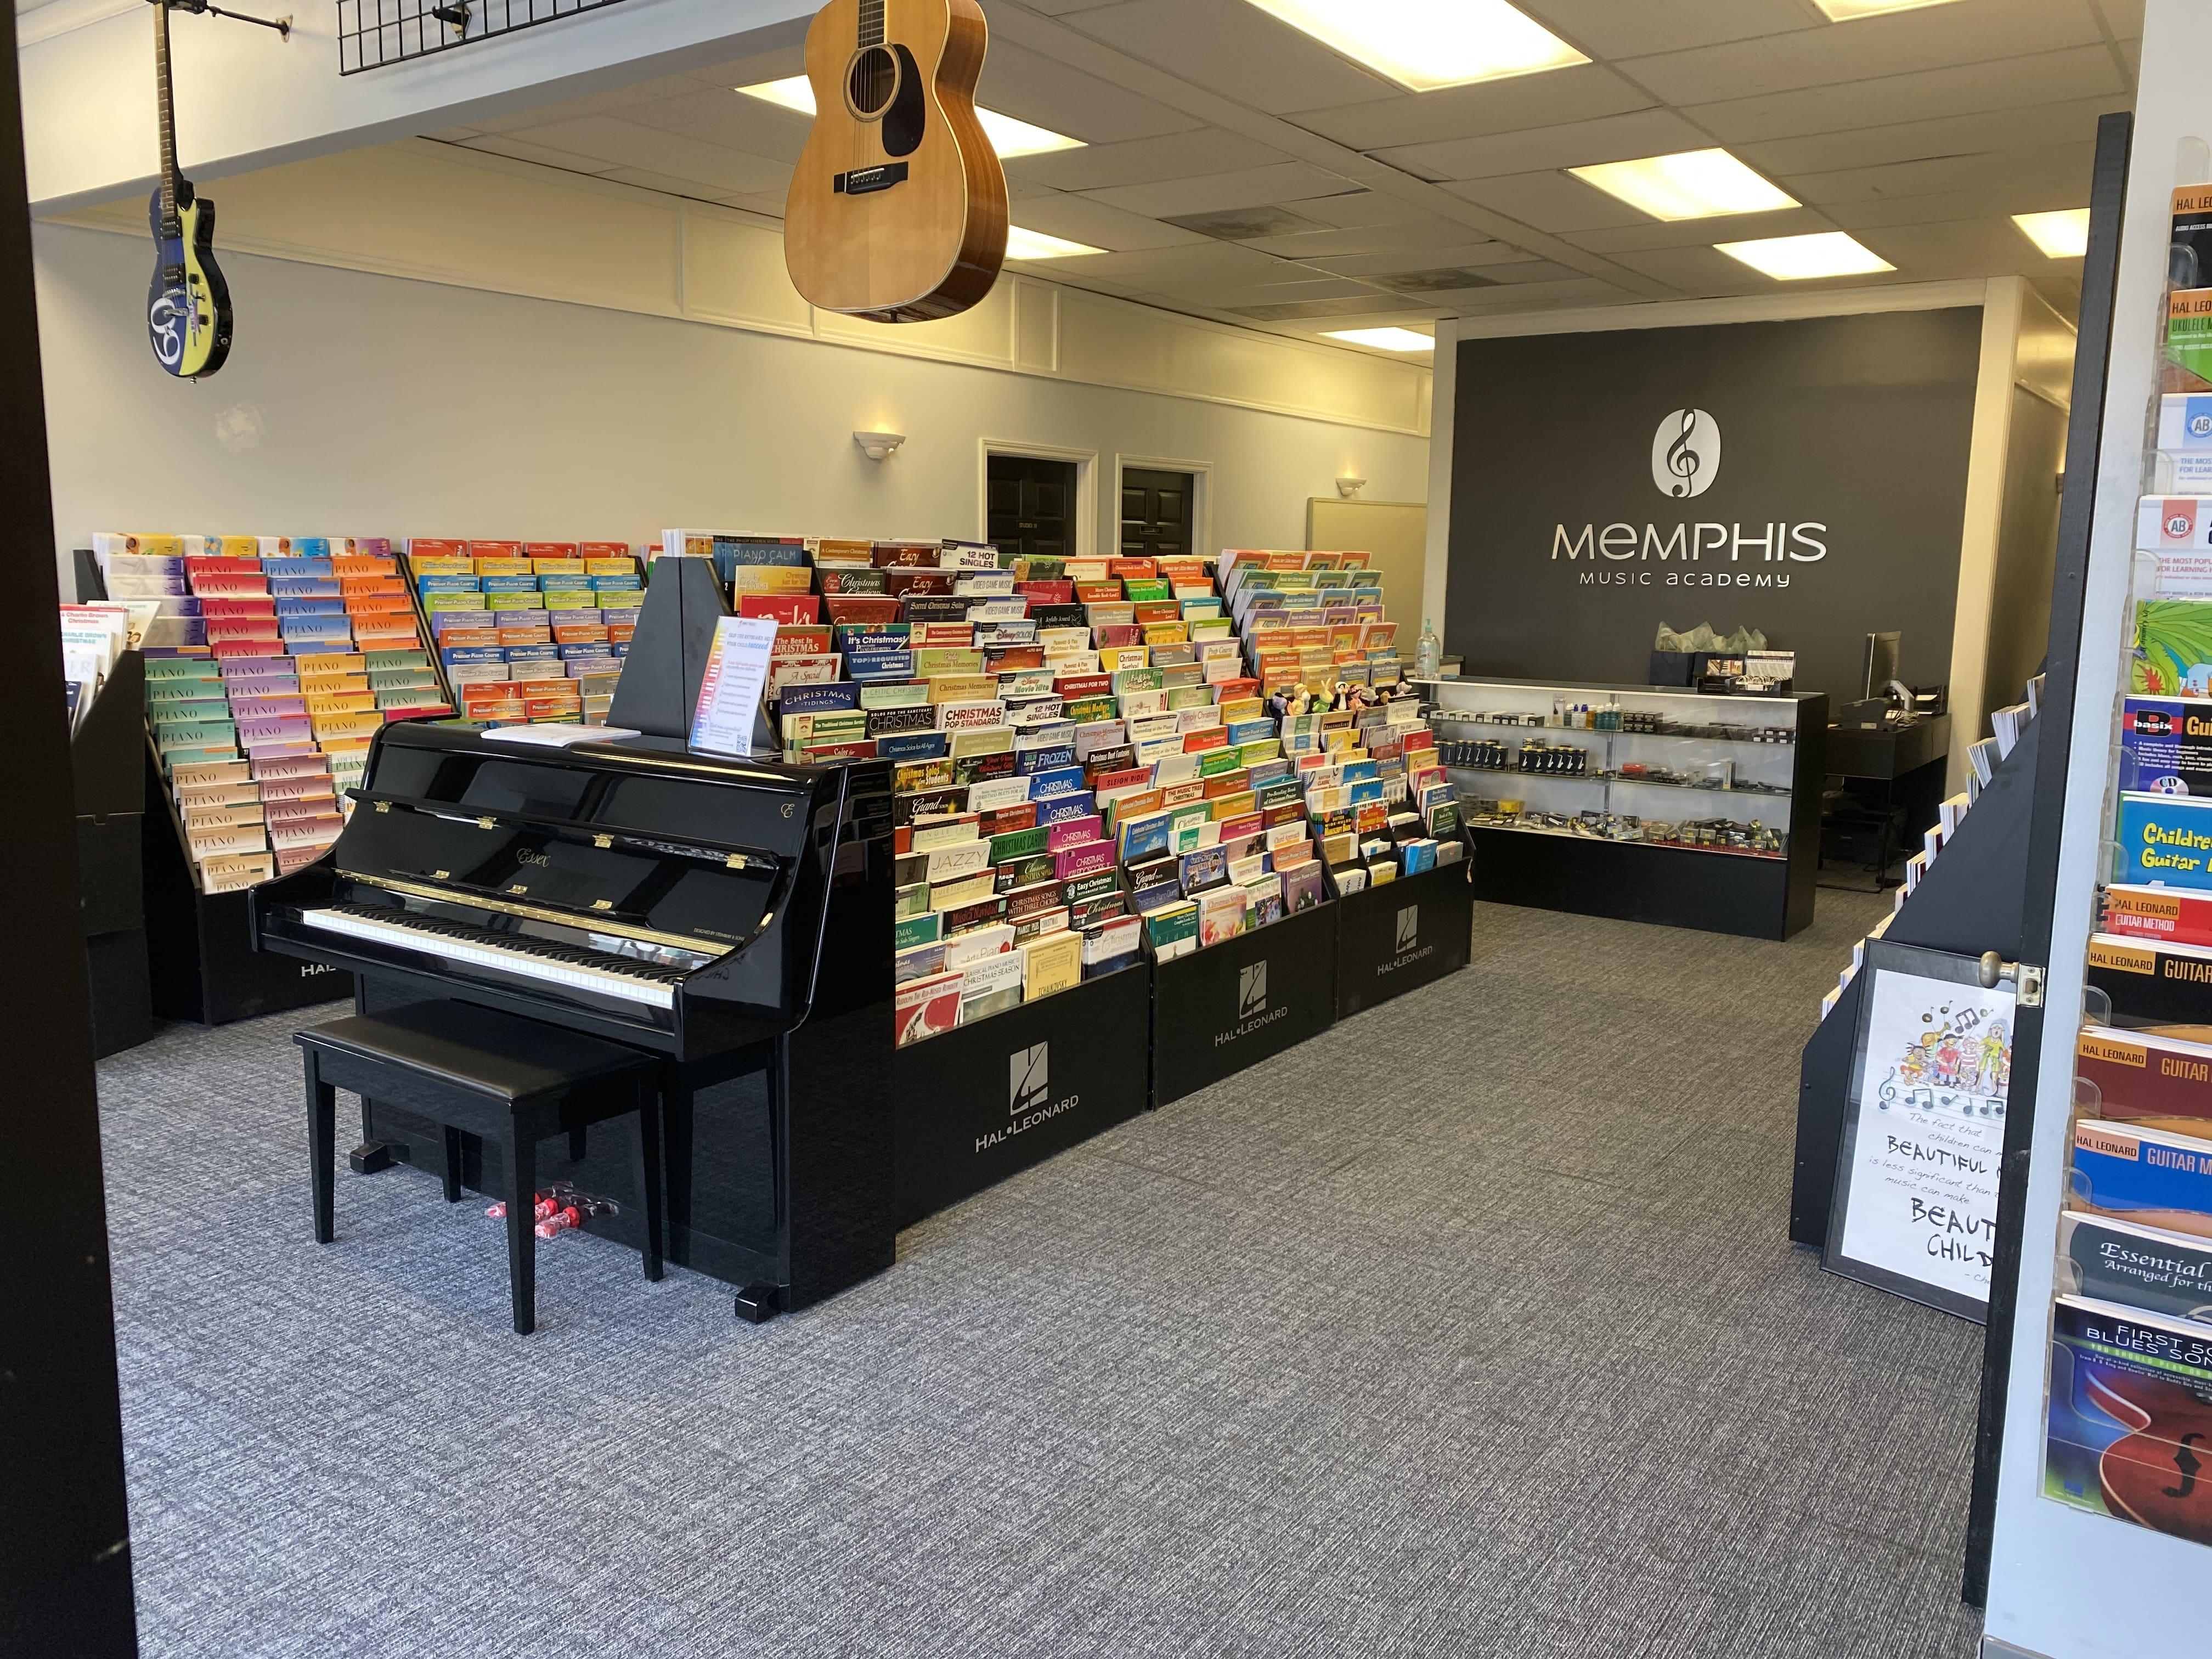 Interior photo of the Memphis Music Academy lobby